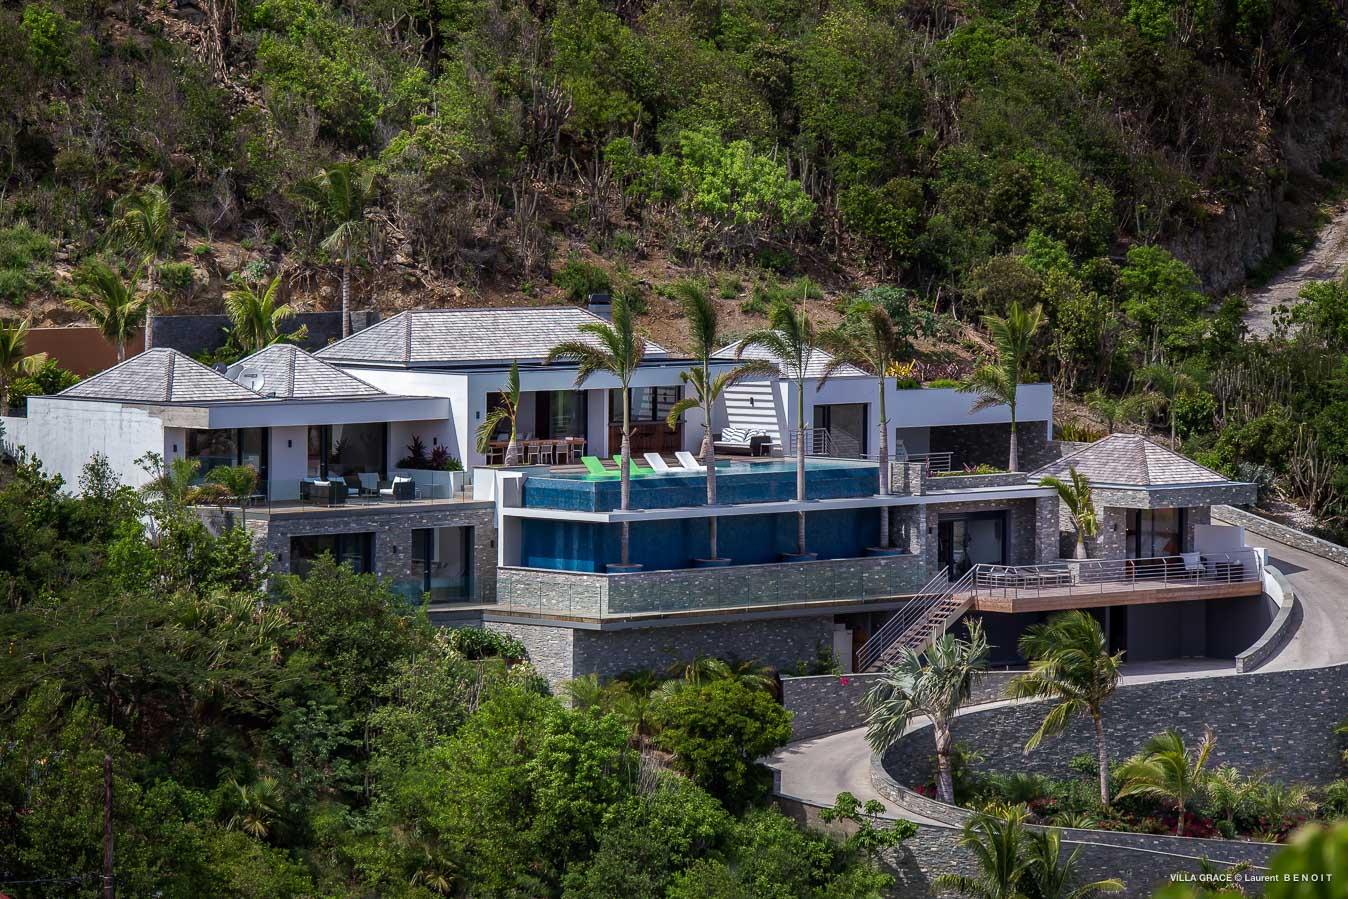 villa vacation rental 6 bedrooms st barth gustavia st barthelemy. Black Bedroom Furniture Sets. Home Design Ideas